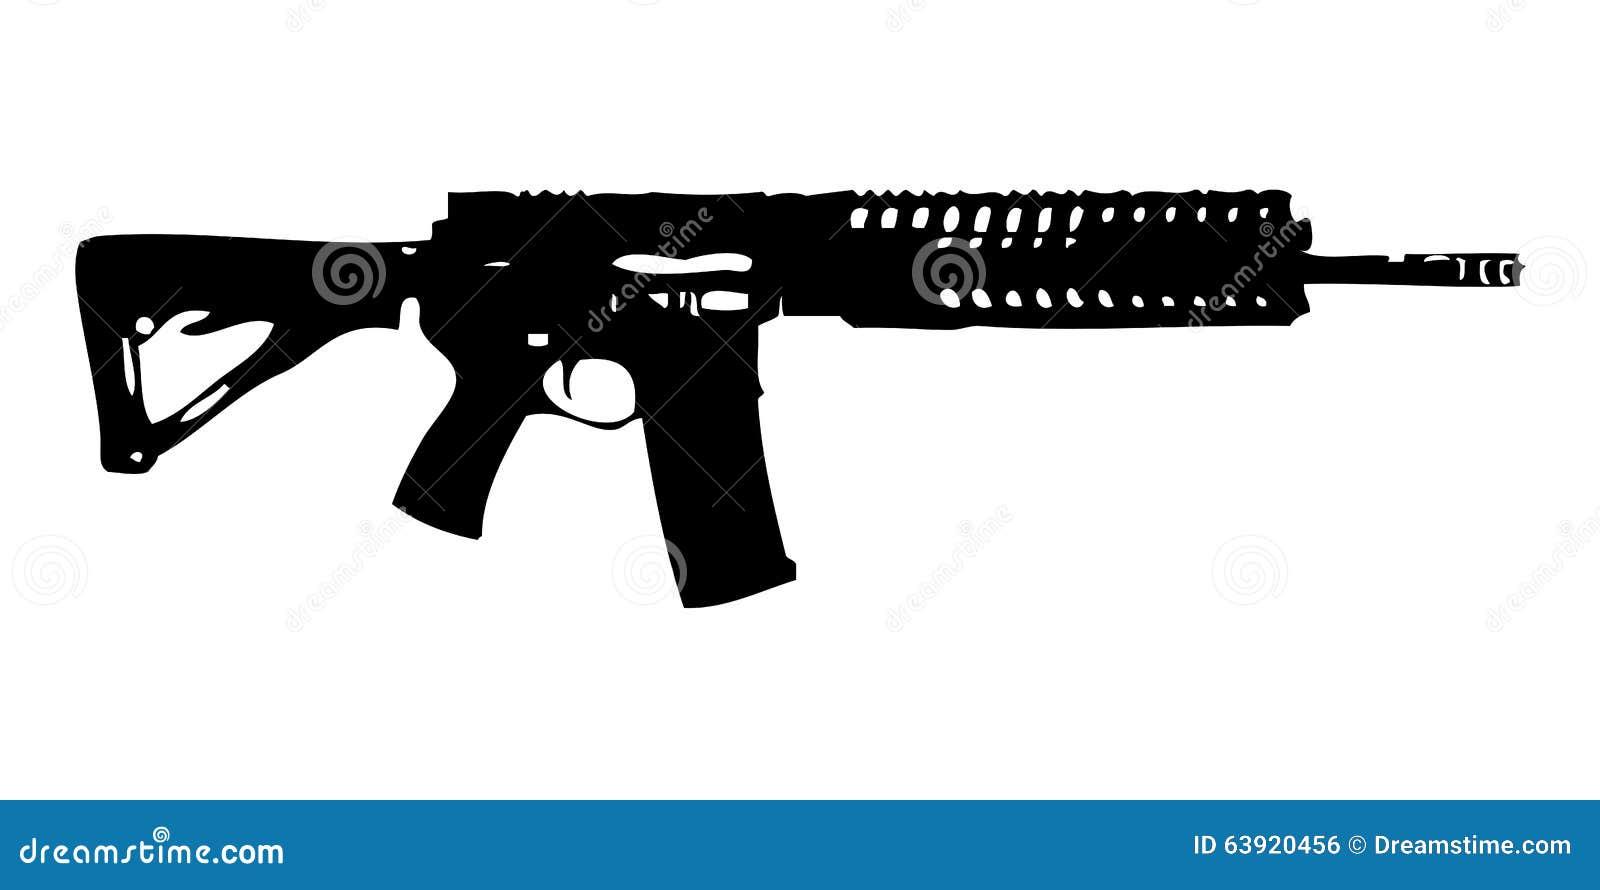 Line Art Gun : Fire gun stock illustration image